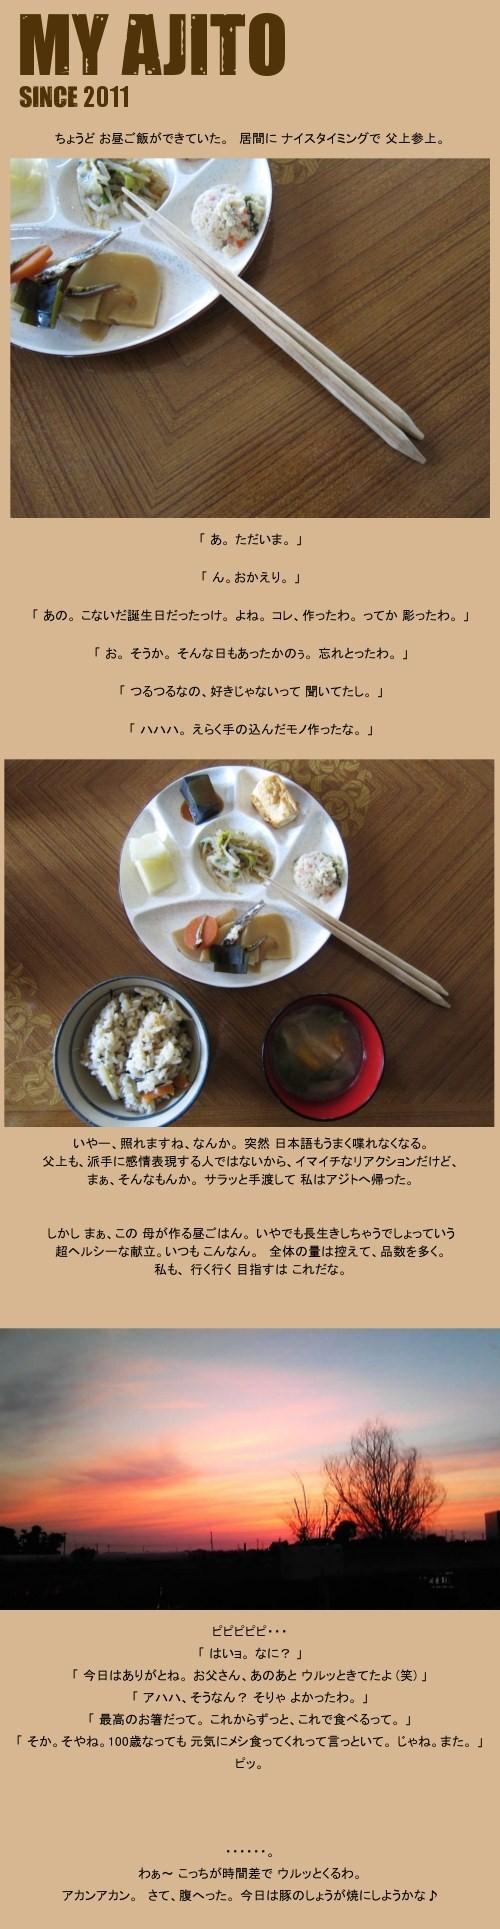 hashi_04.jpg